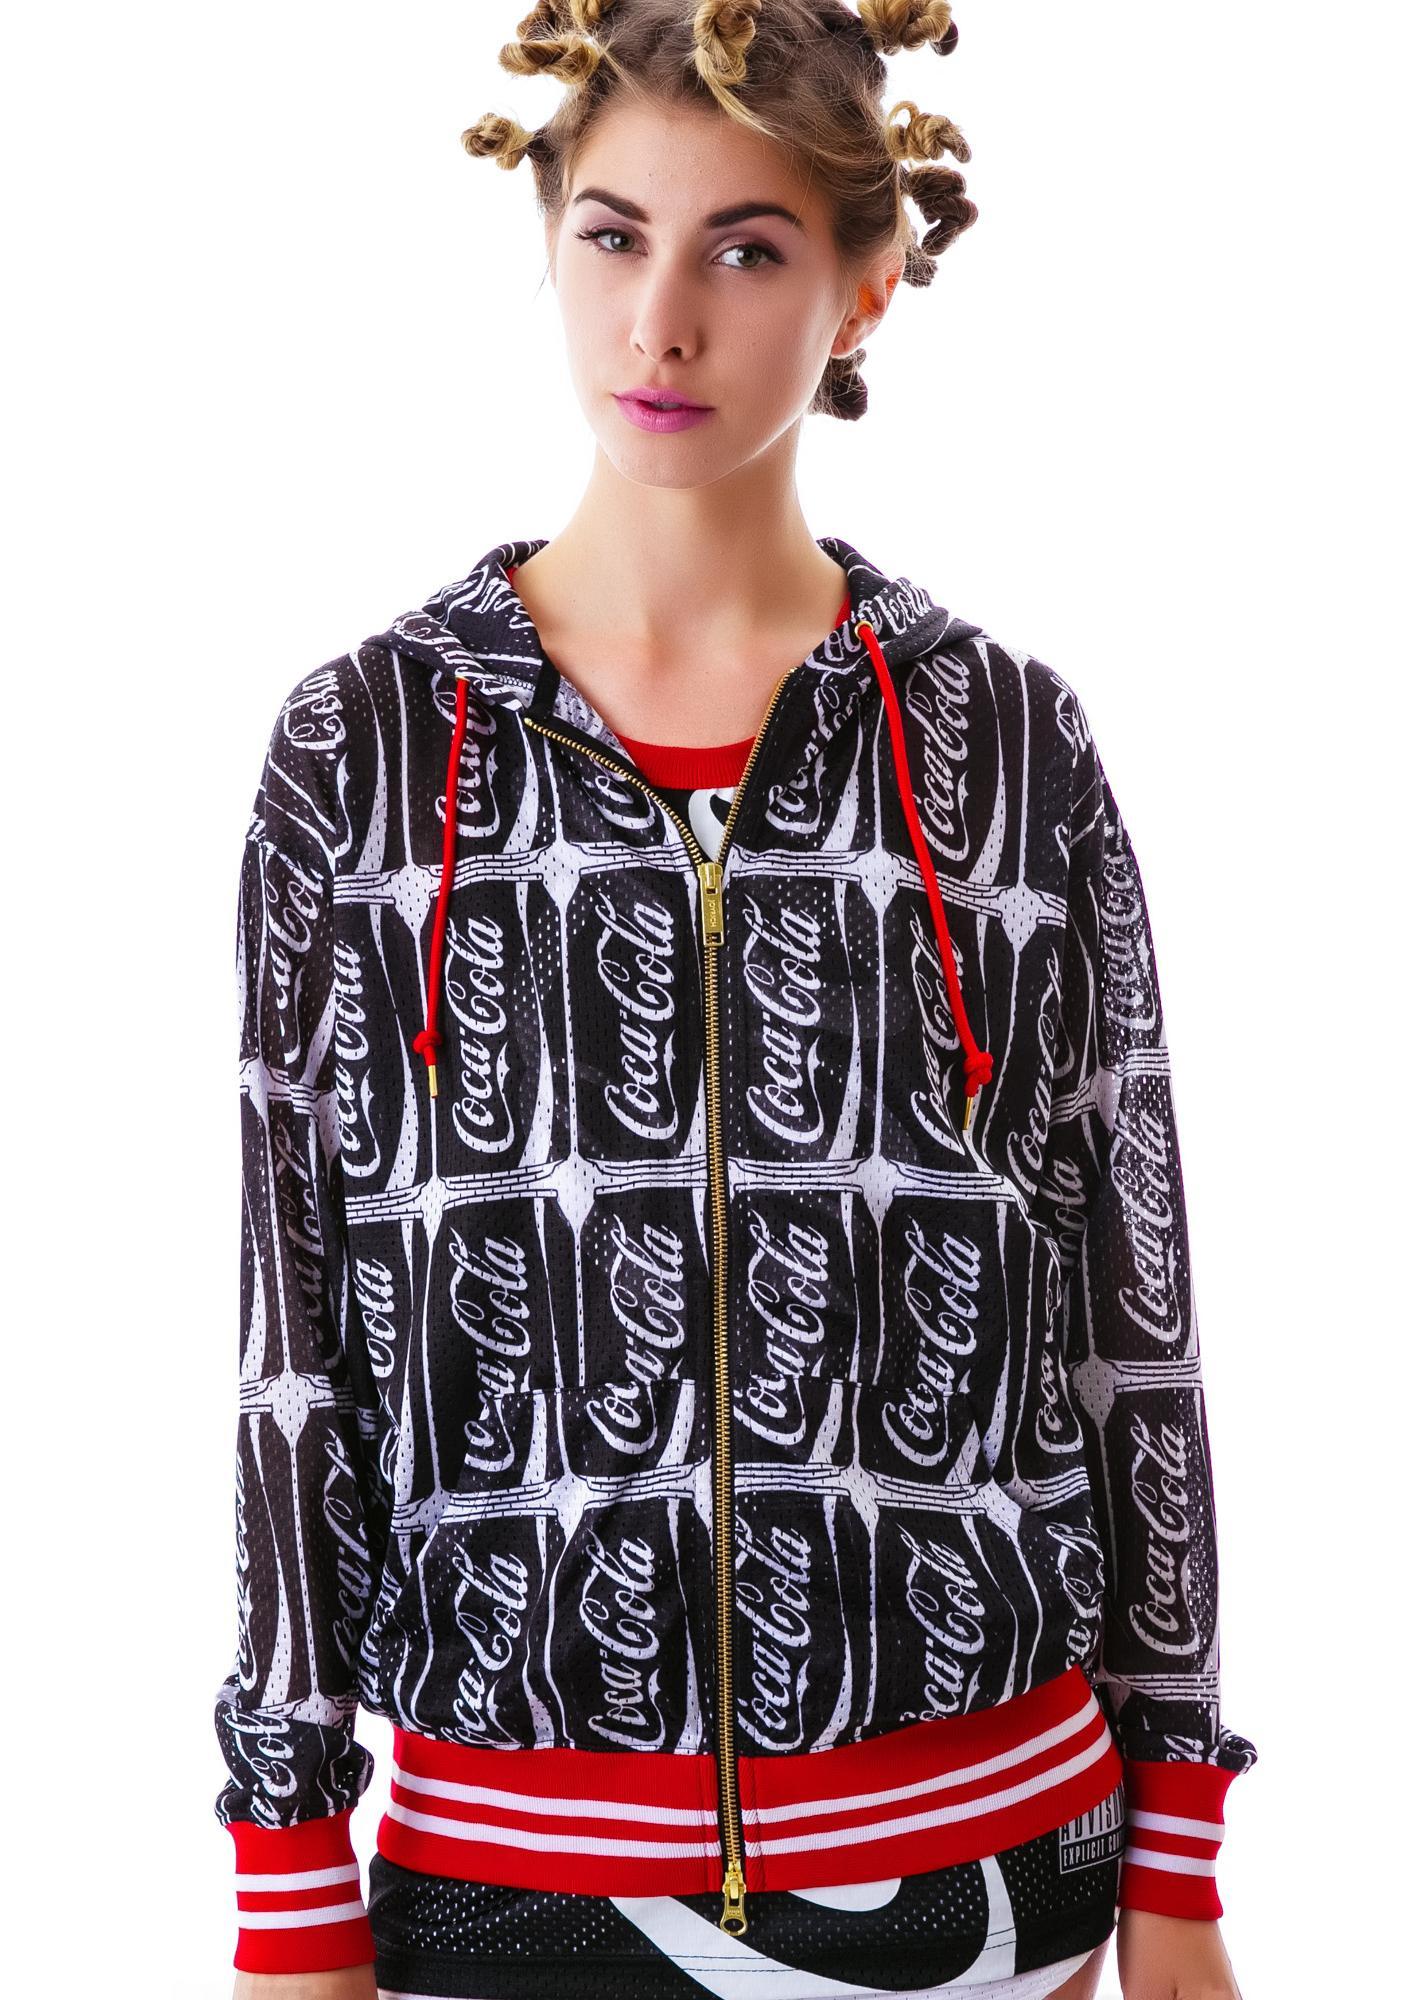 Joyrich Coca-Cola Mesh Hoodie